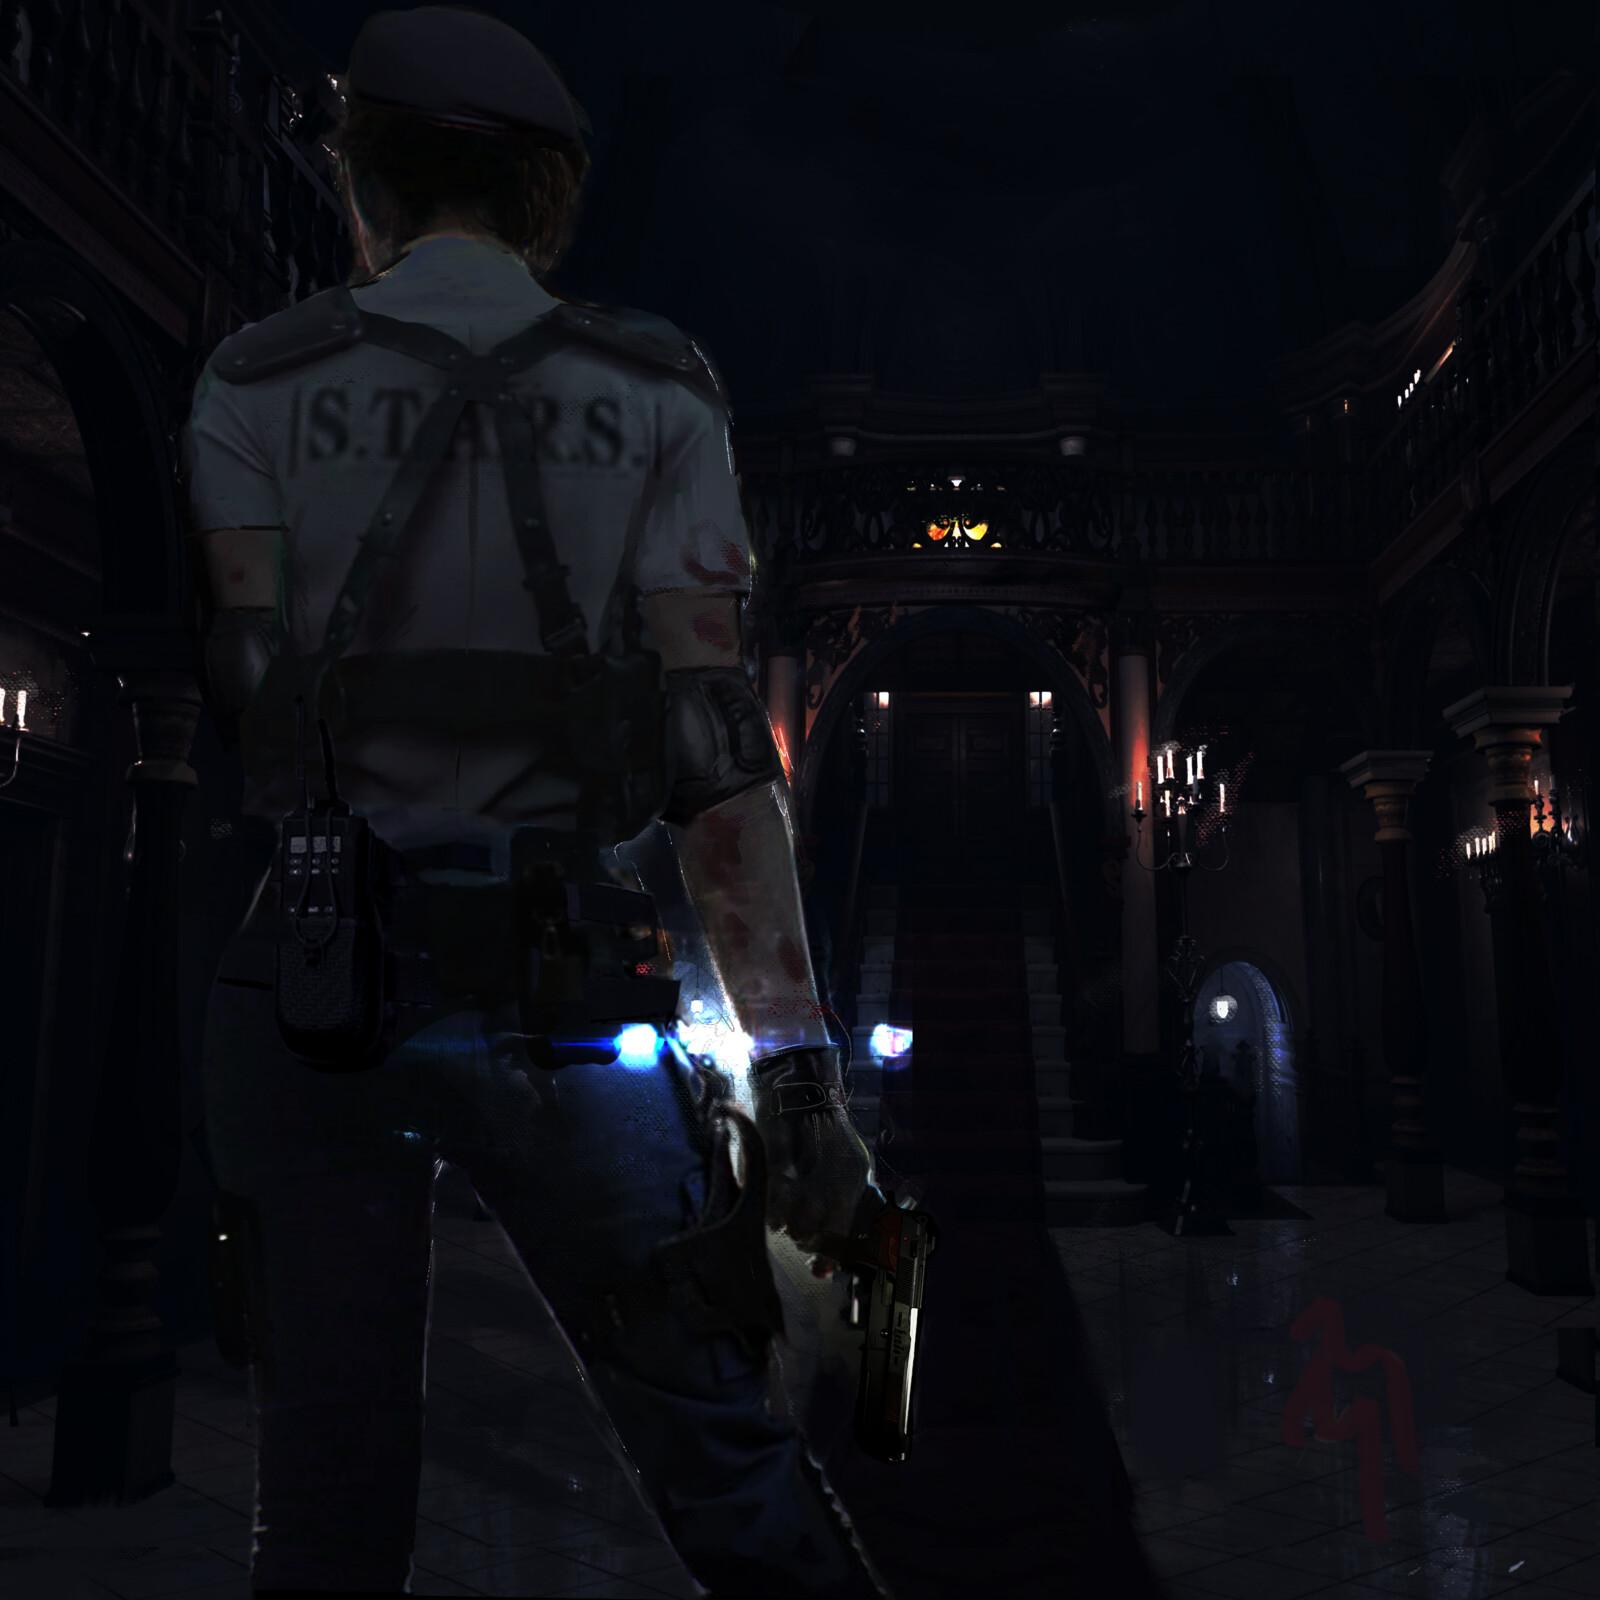 Resident Evil: I almost drew a Jill sandwich!